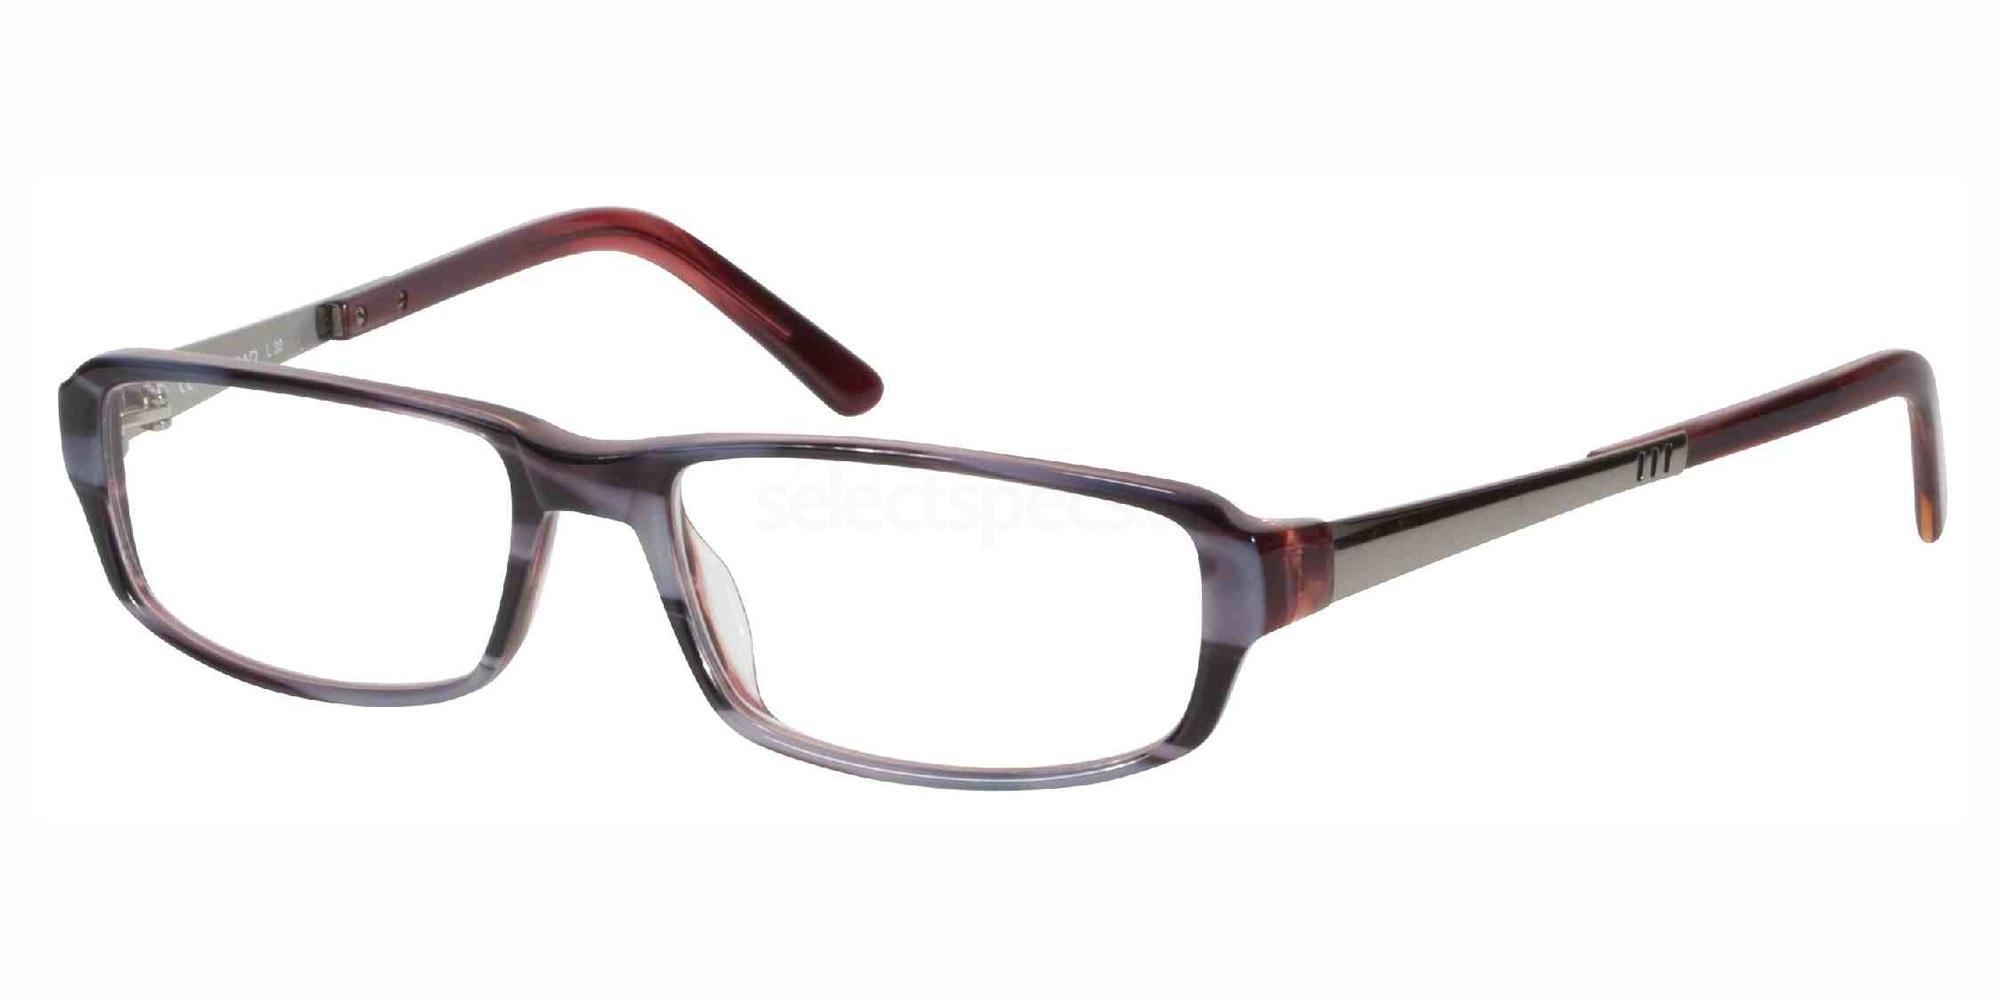 8342 12003 , MENRAD Eyewear